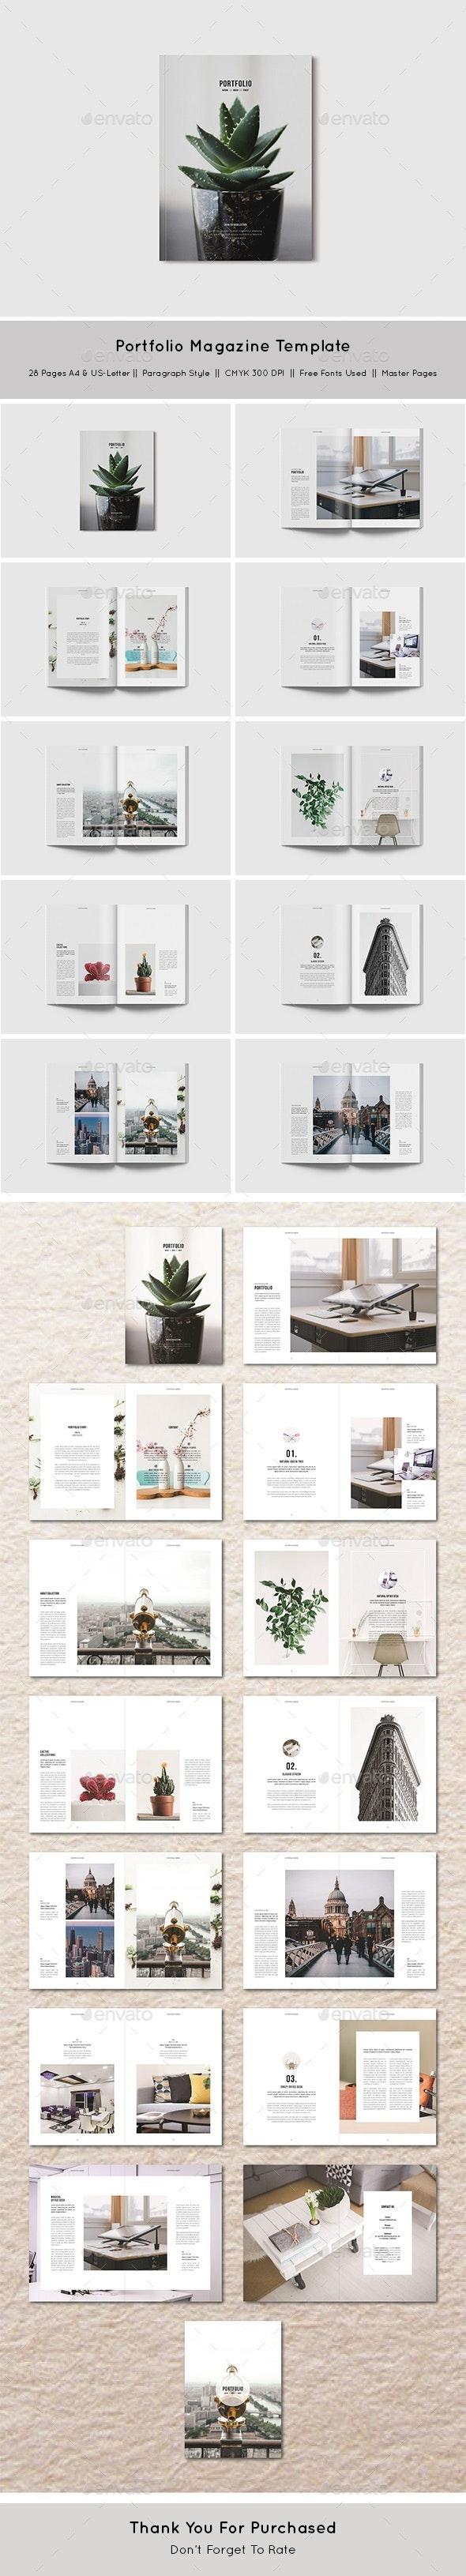 Portfolio Magazine Template - Magazines Print Templates